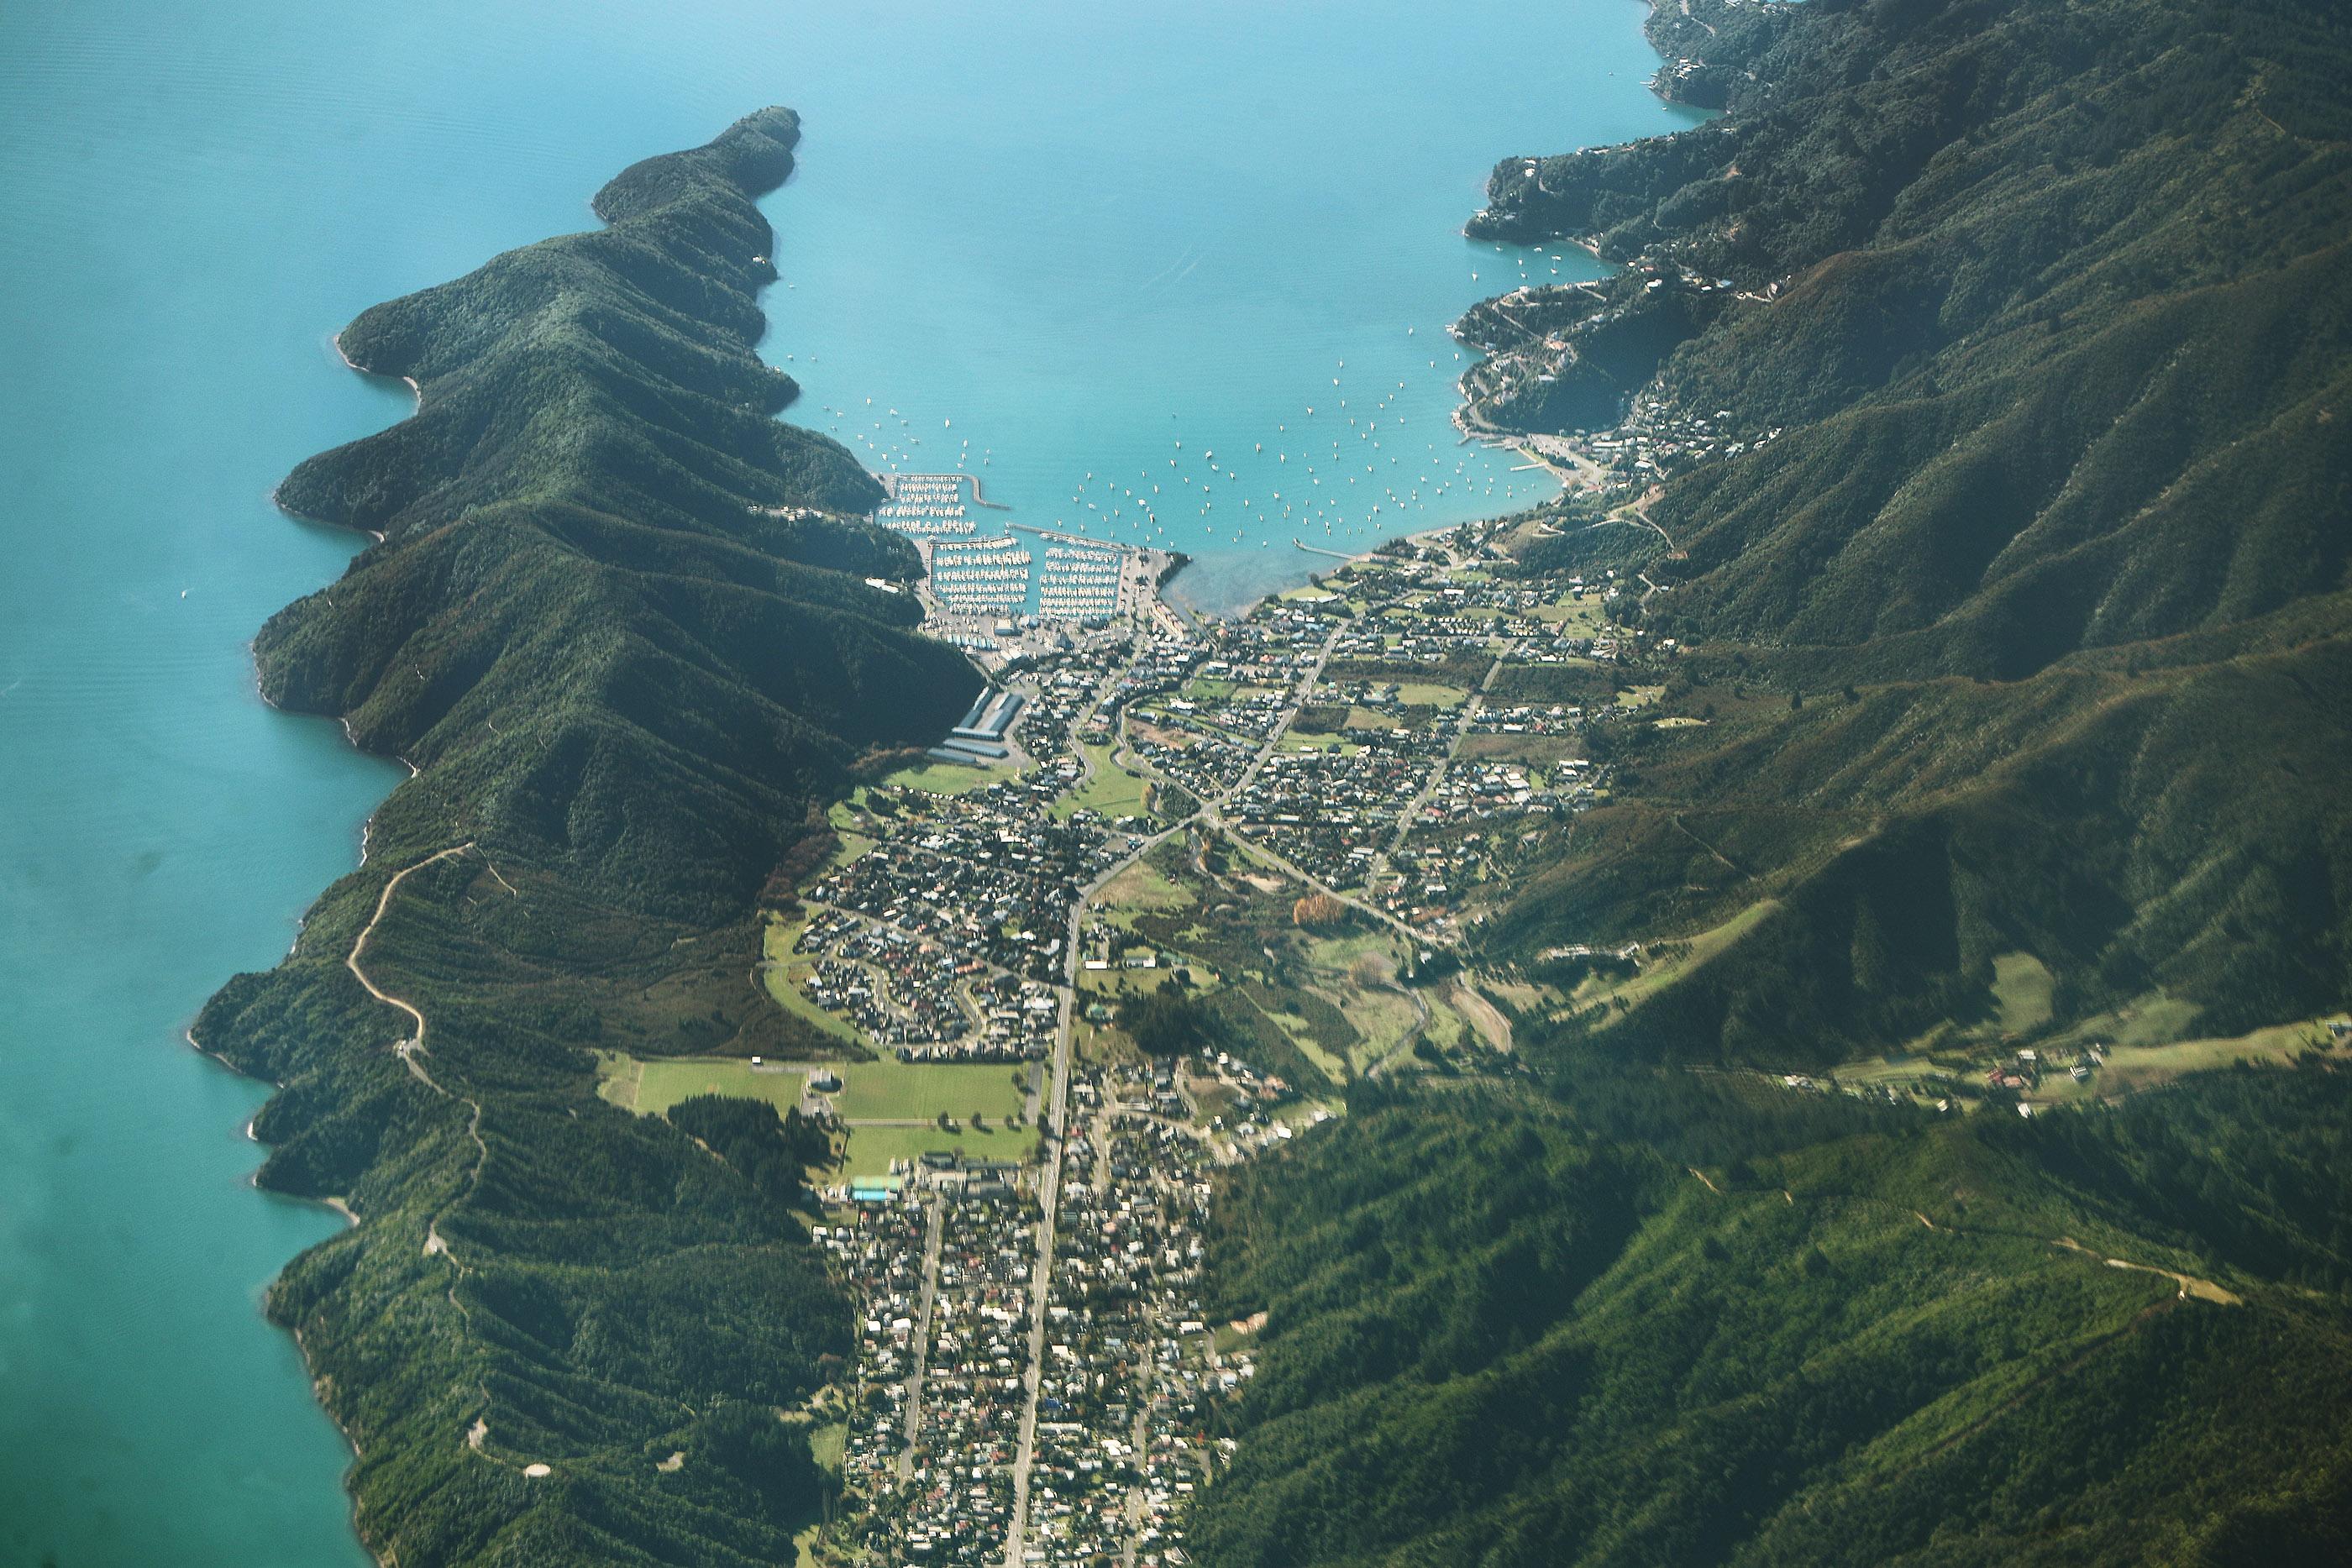 A coastal community in Wellington, New Zealand, on Monday, May 20, 2019.